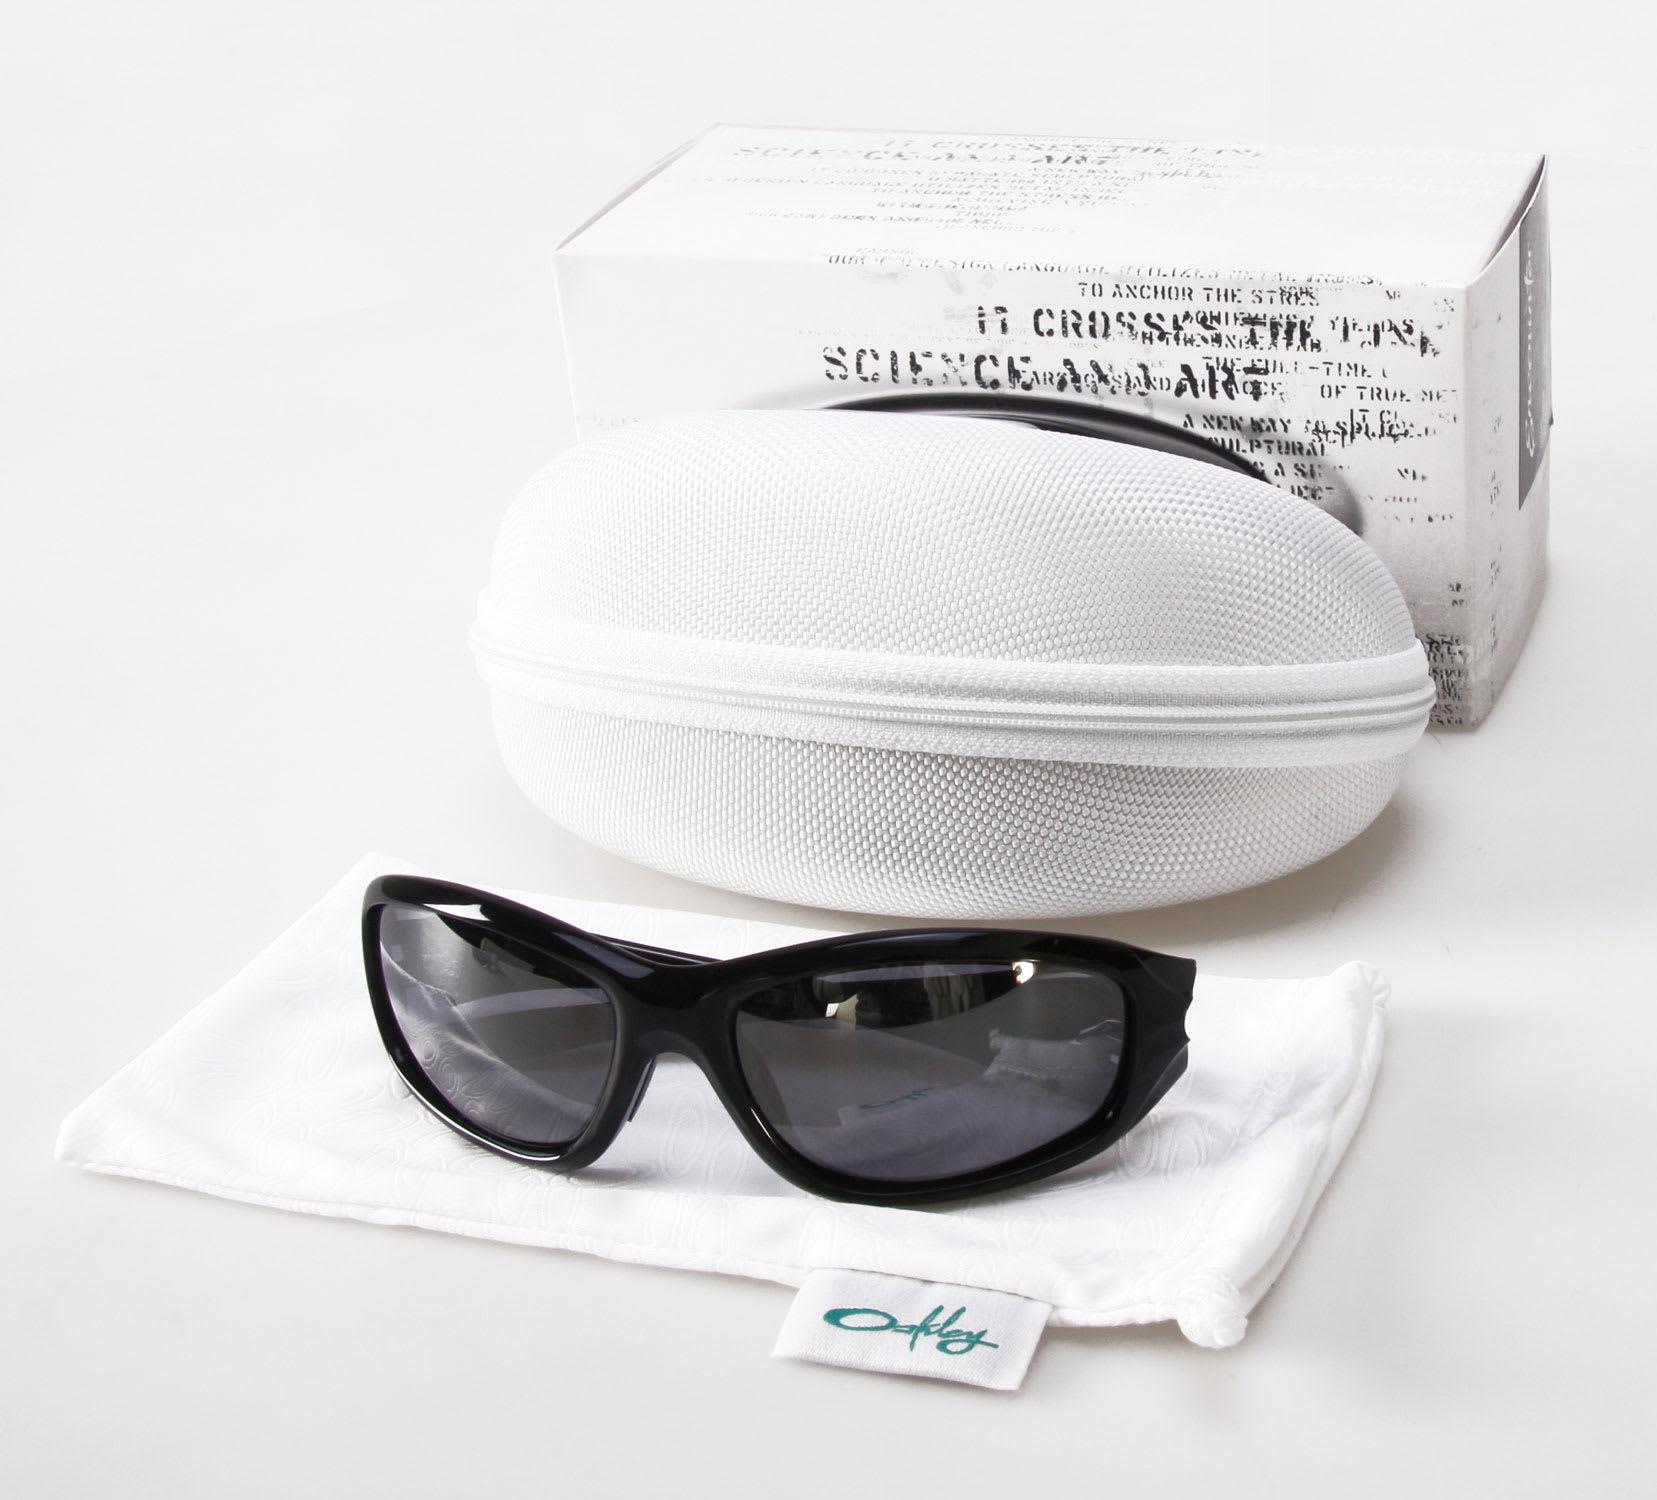 68ec3dc8a87 Oakley Encounter Prescription Sunglasses